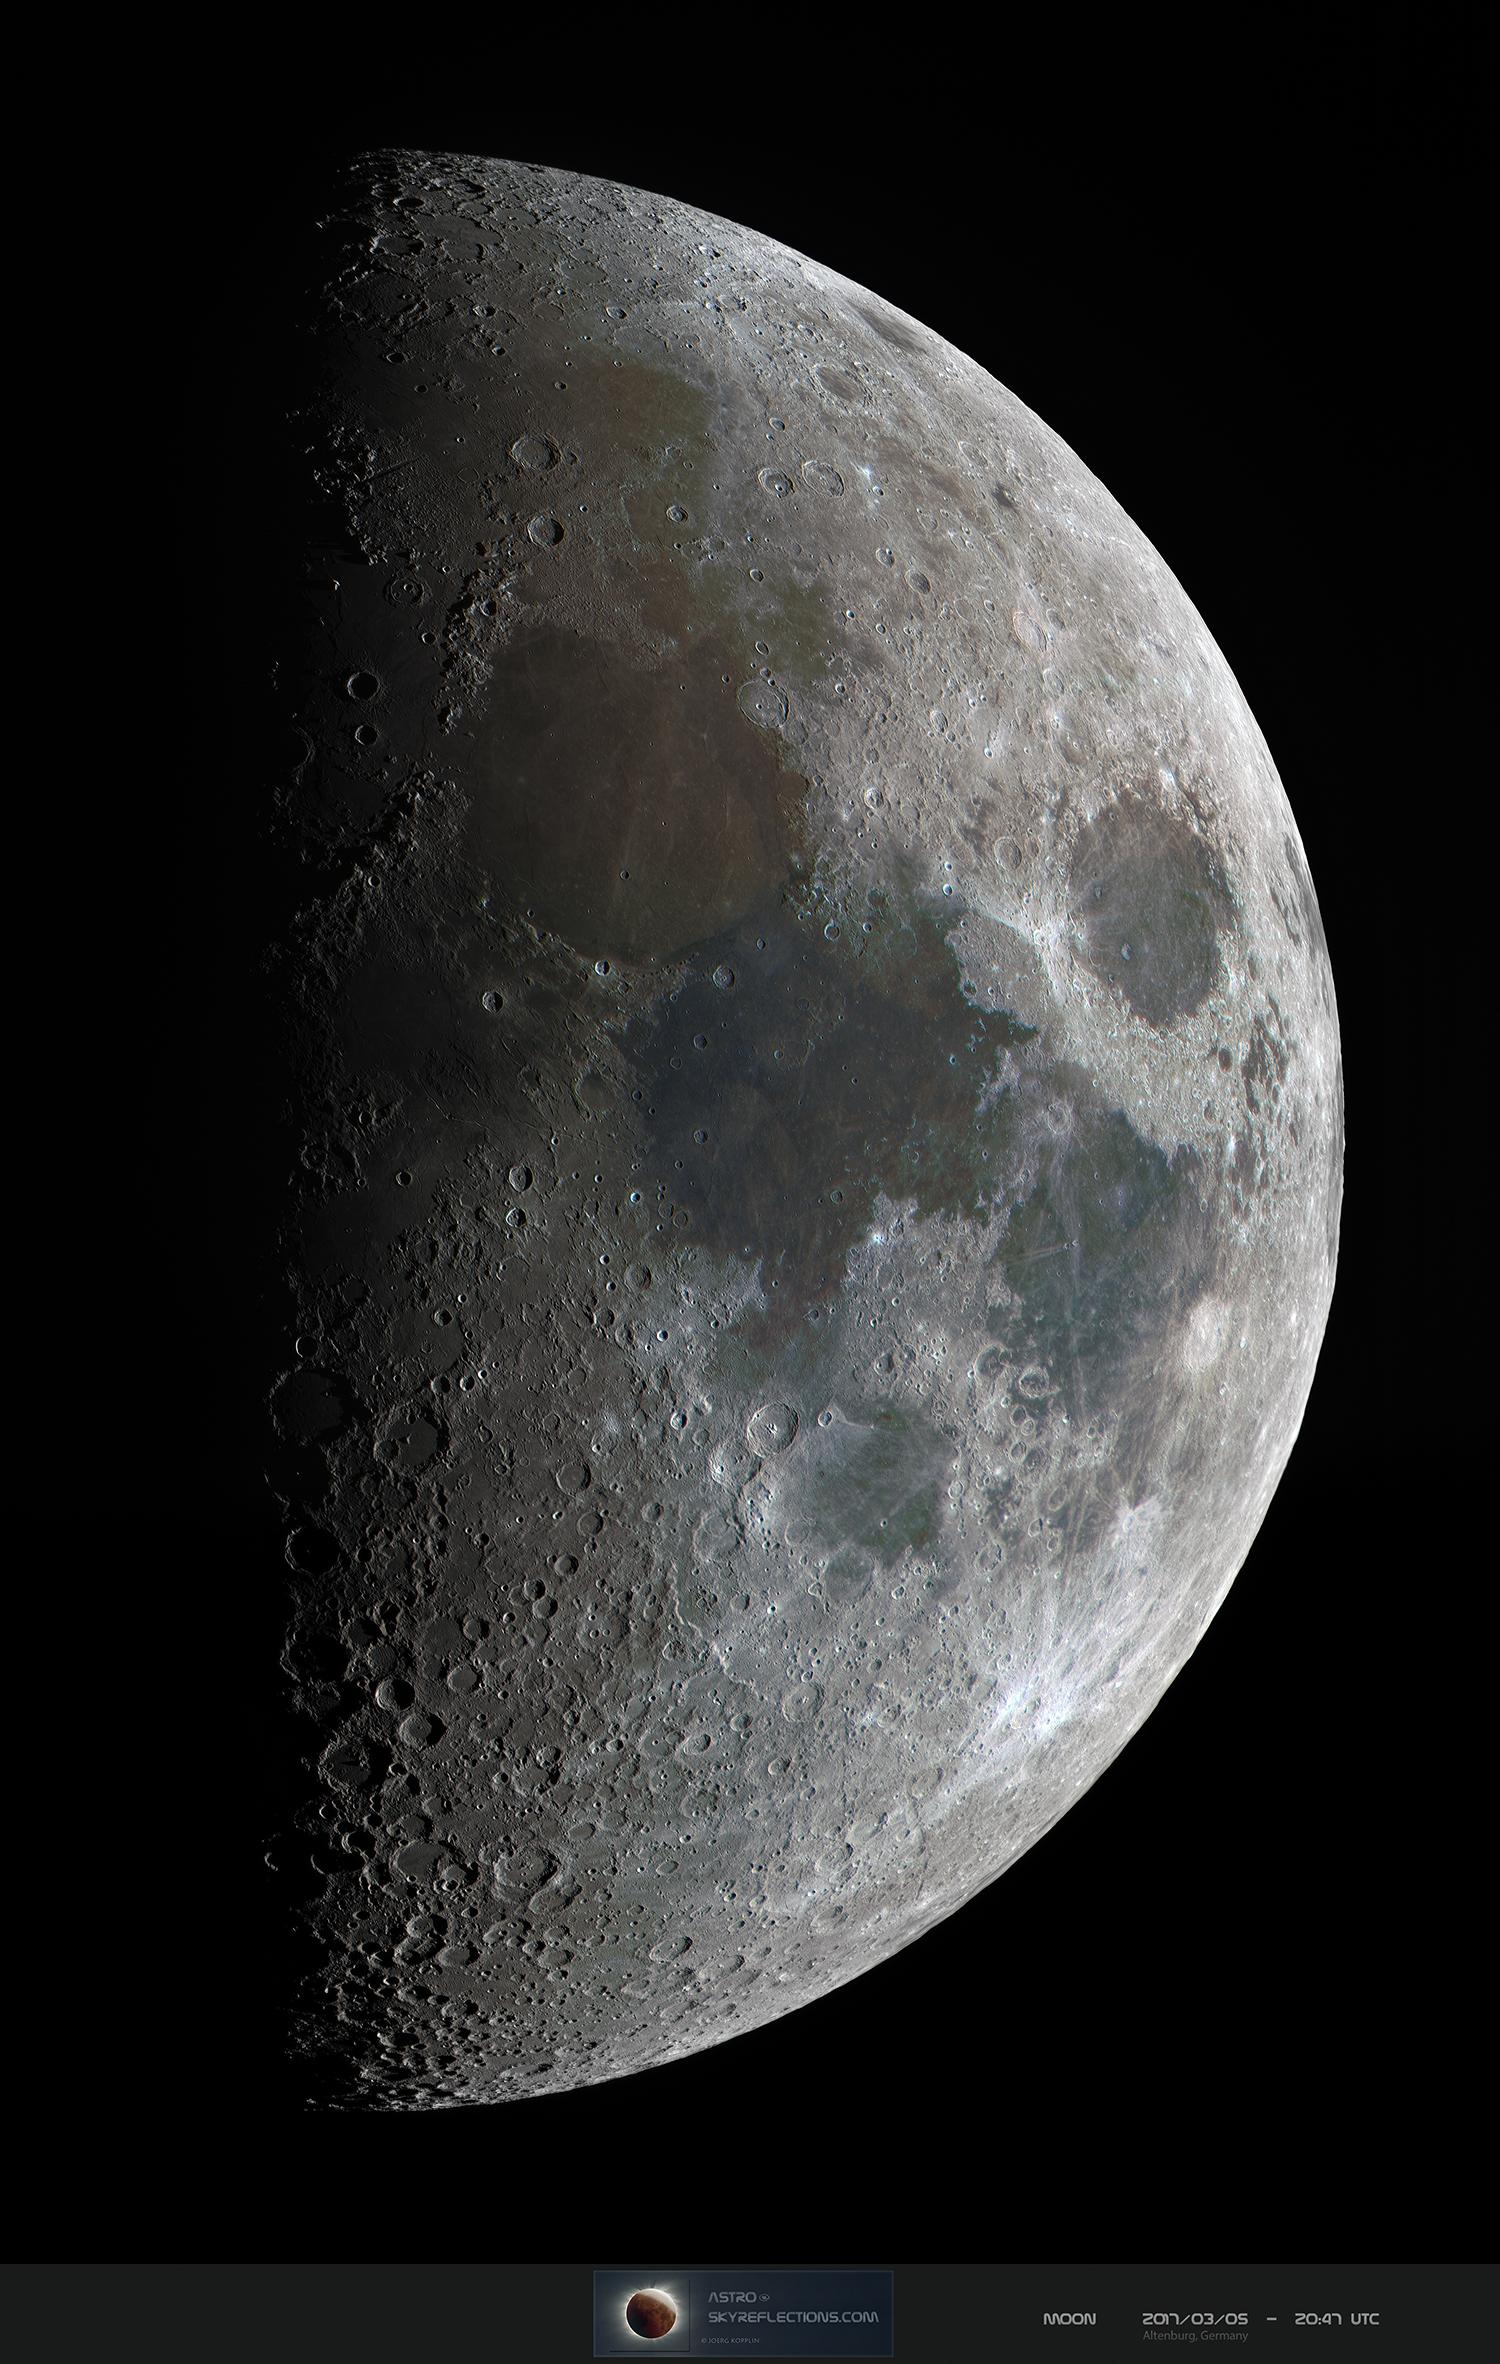 moon_20170305_2147-54-55_llfinalenh_log50